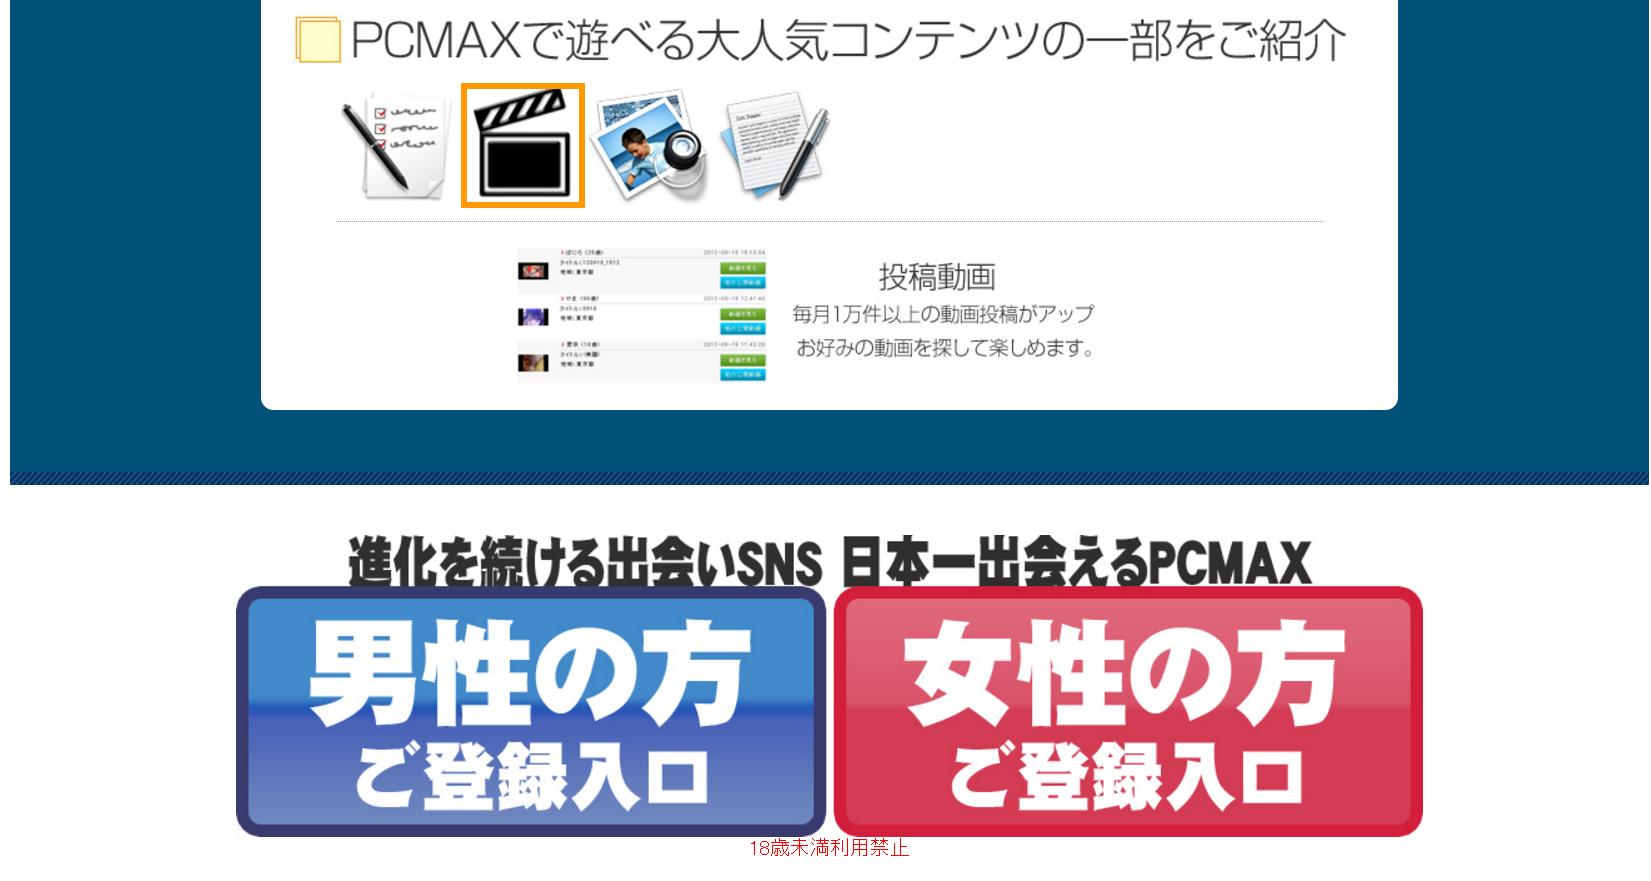 PCMAX 登録移動